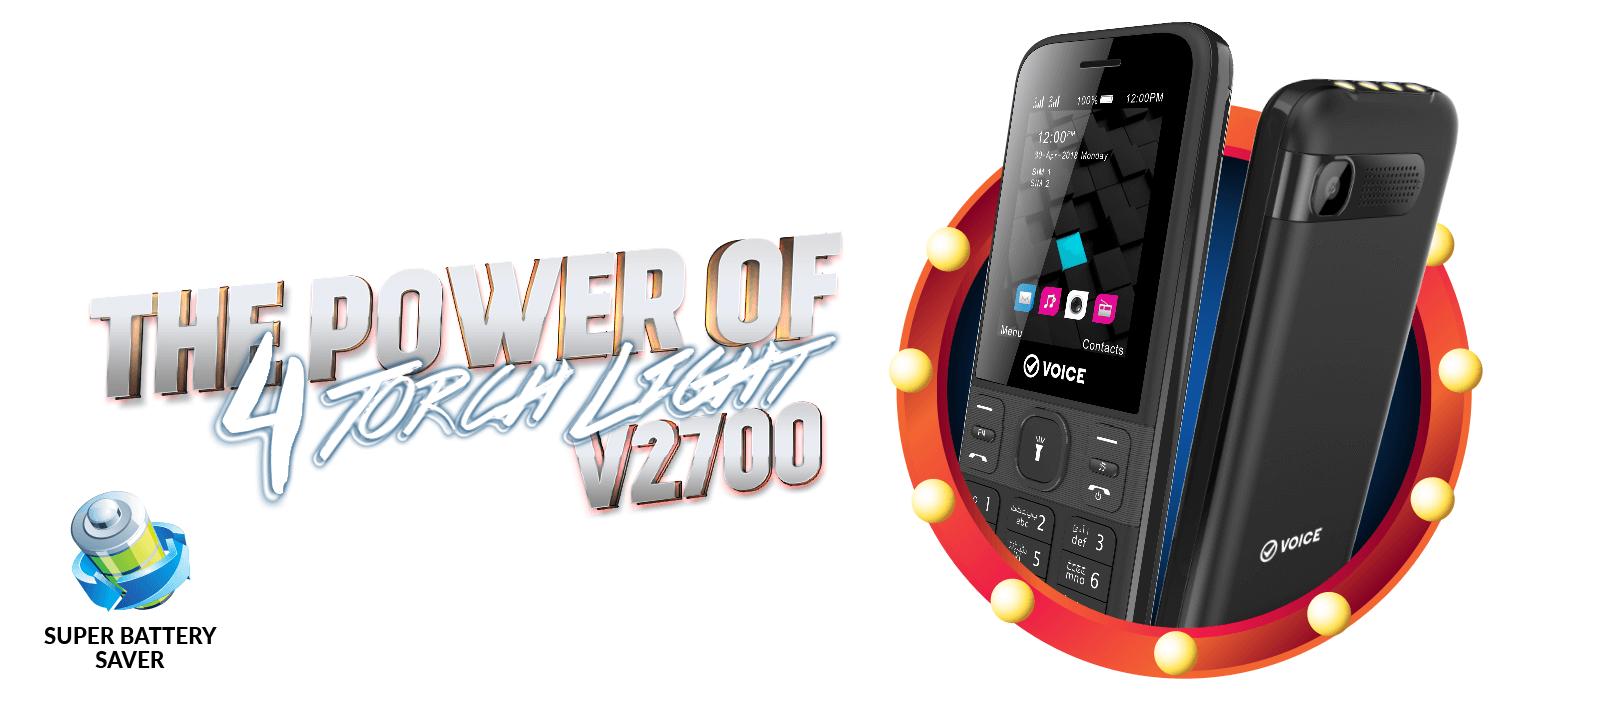 v2700